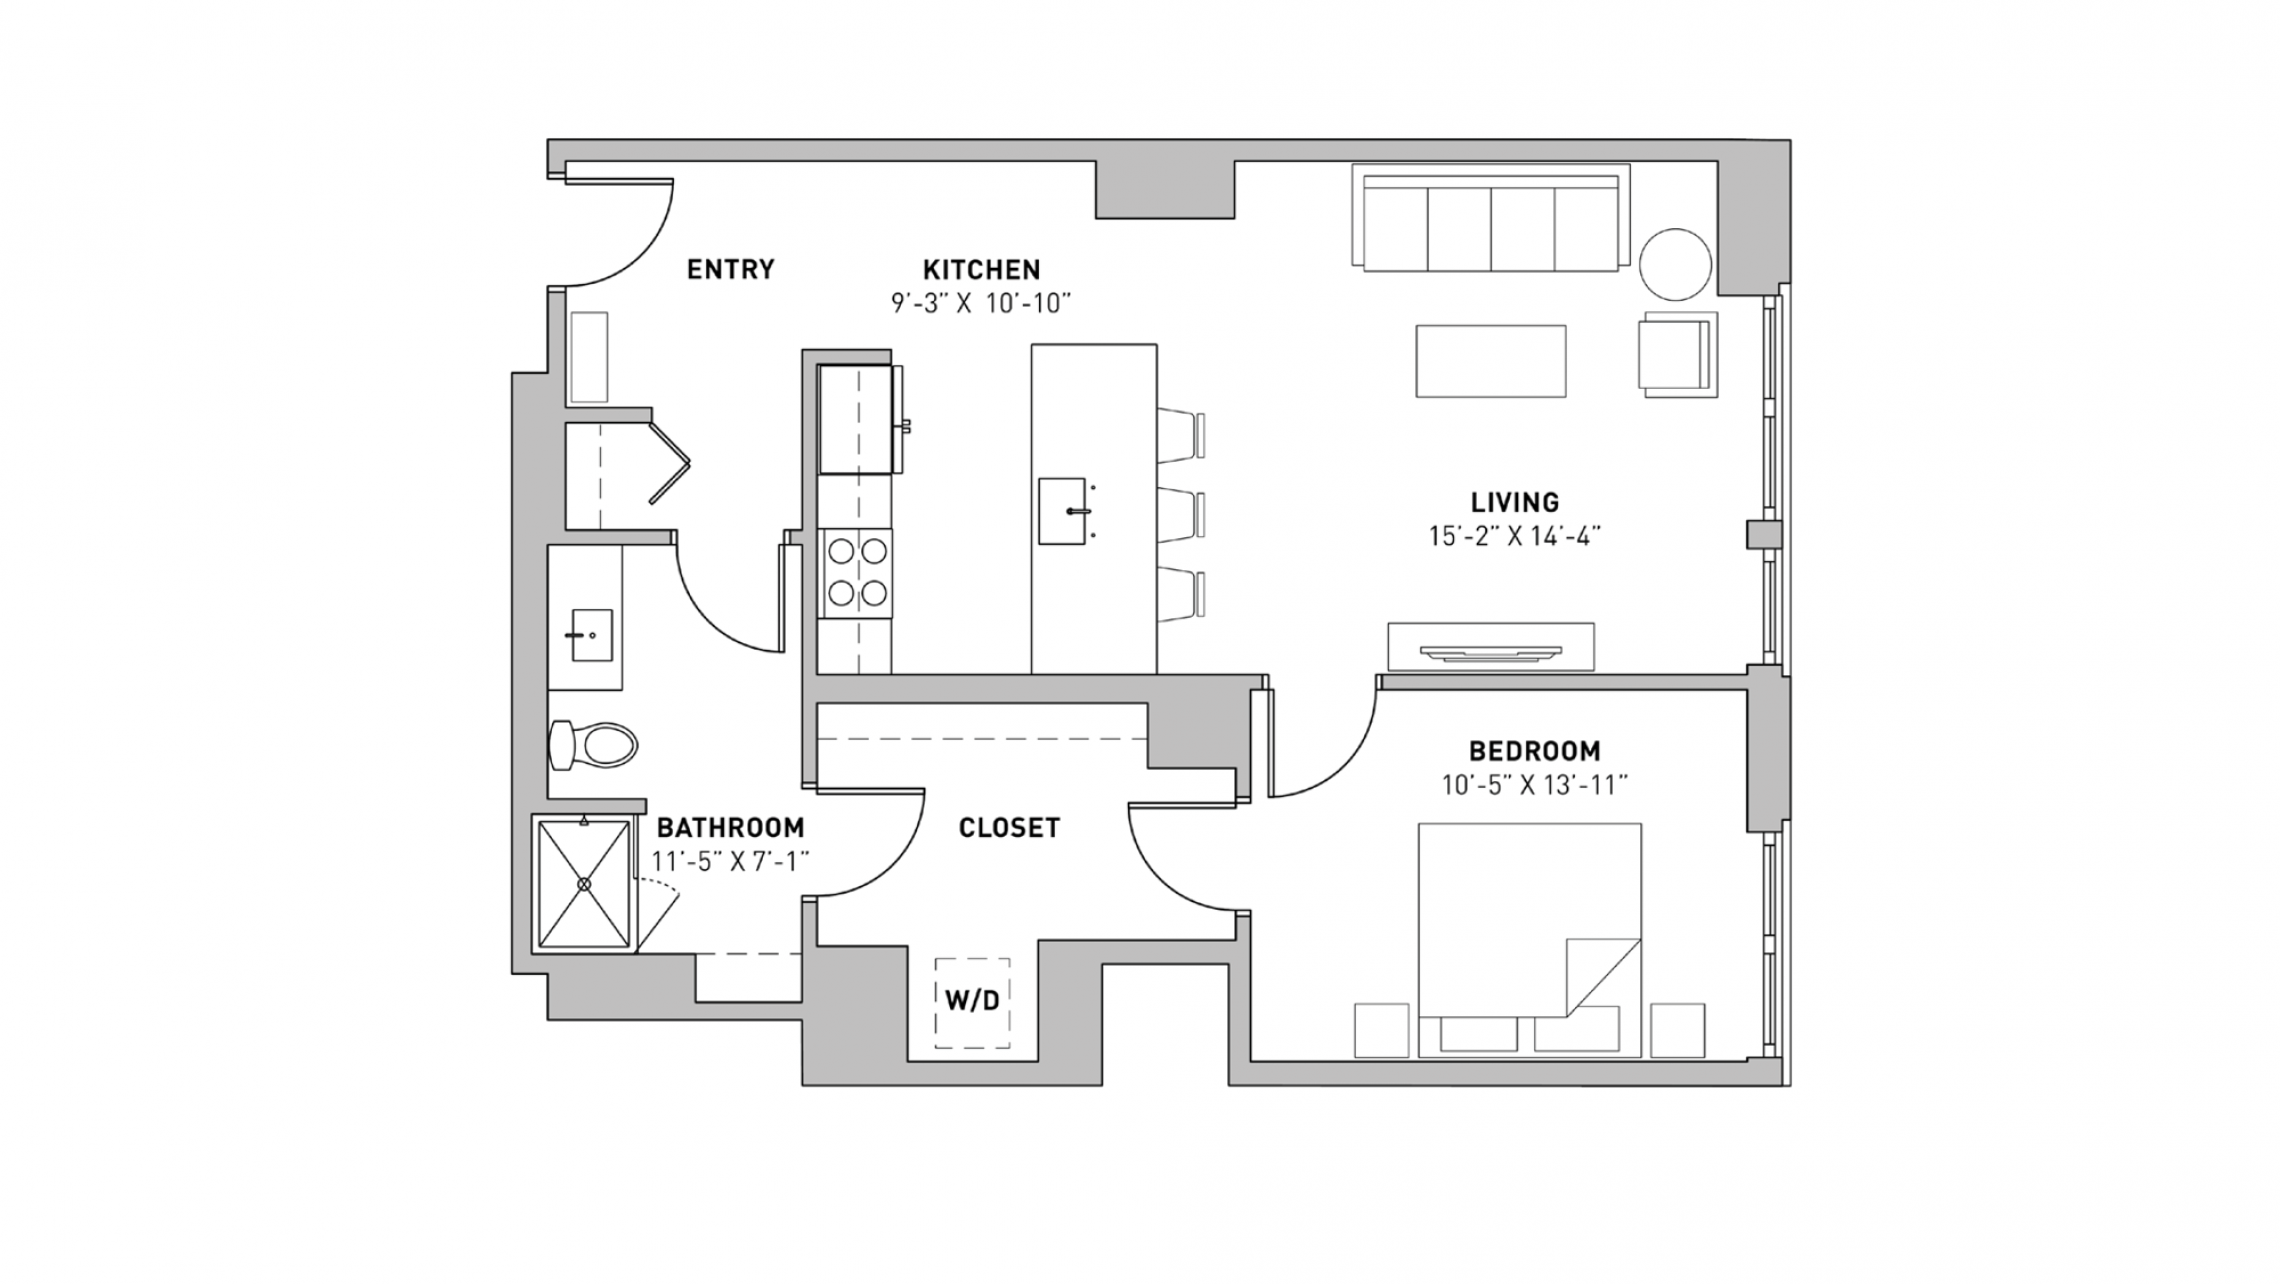 ULI The Pressman 711 - One Bedroom, One Bathroom